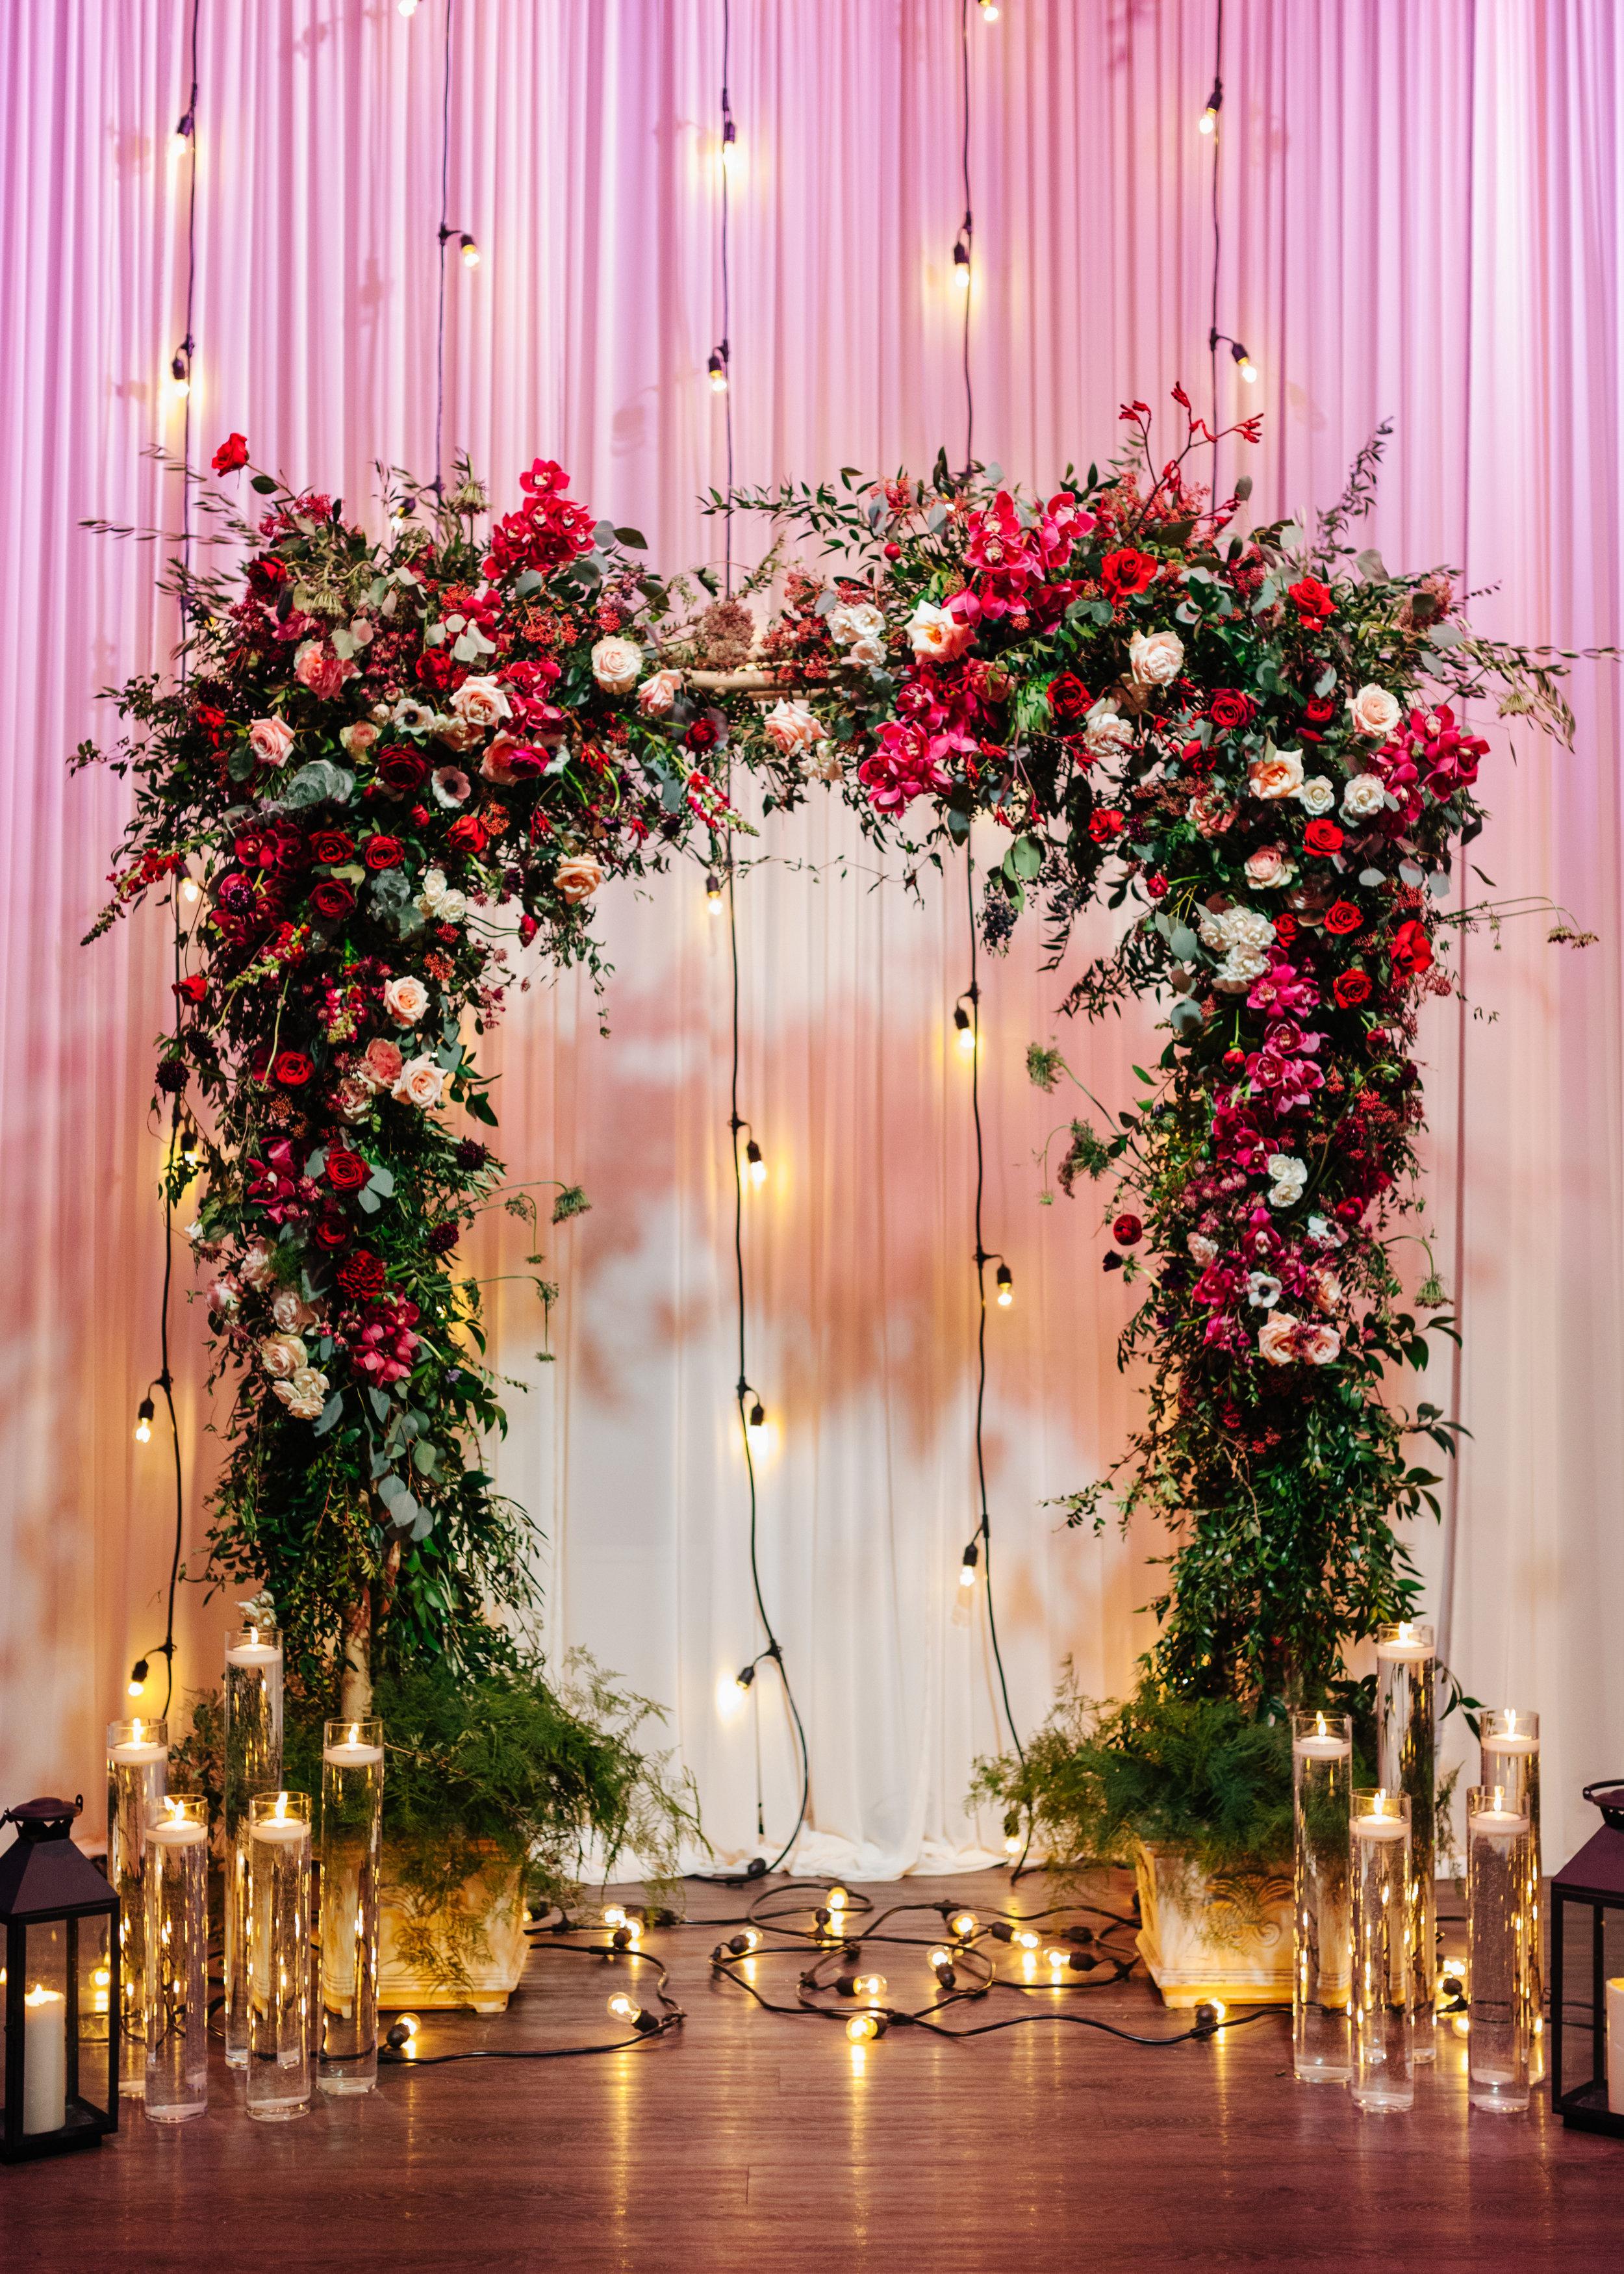 herastudios_event_bride_groom_hera_selects-11.jpg